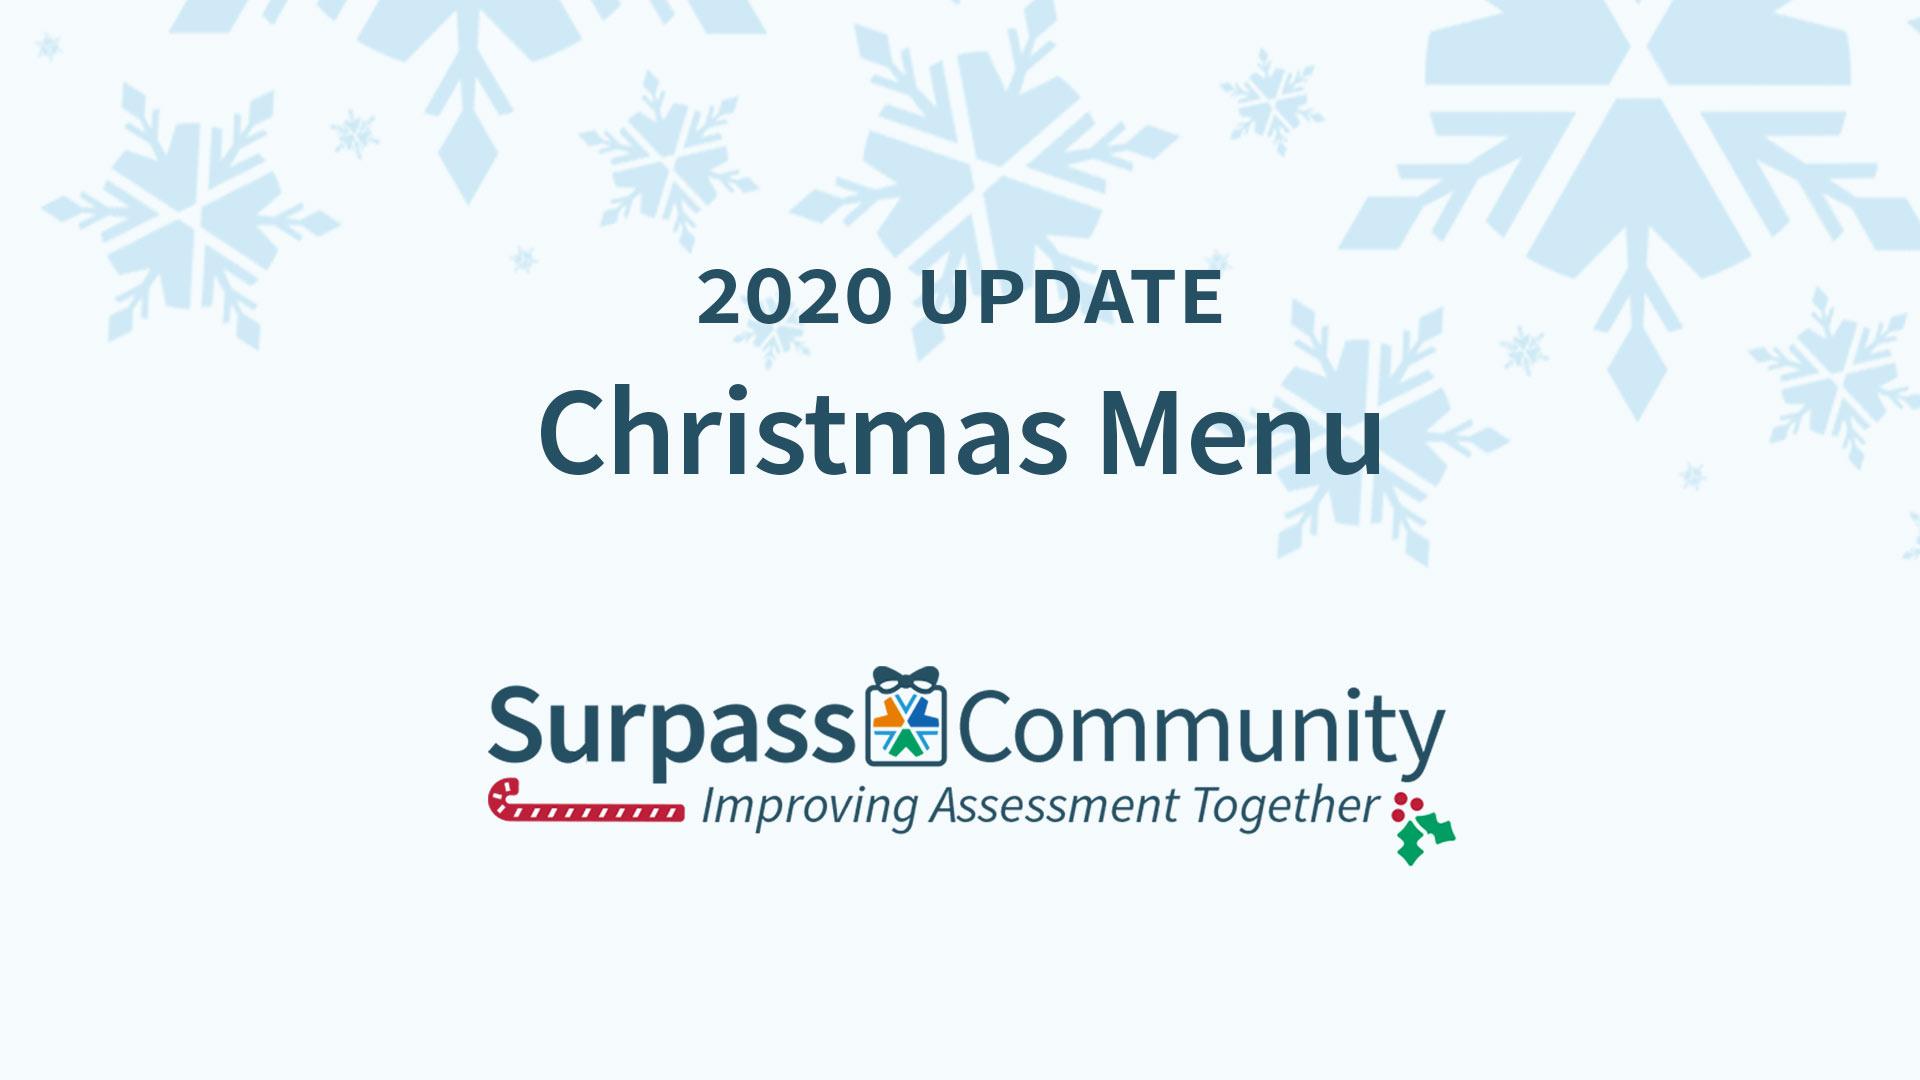 Surpass Community 2020 Updates in a Christmas Menu